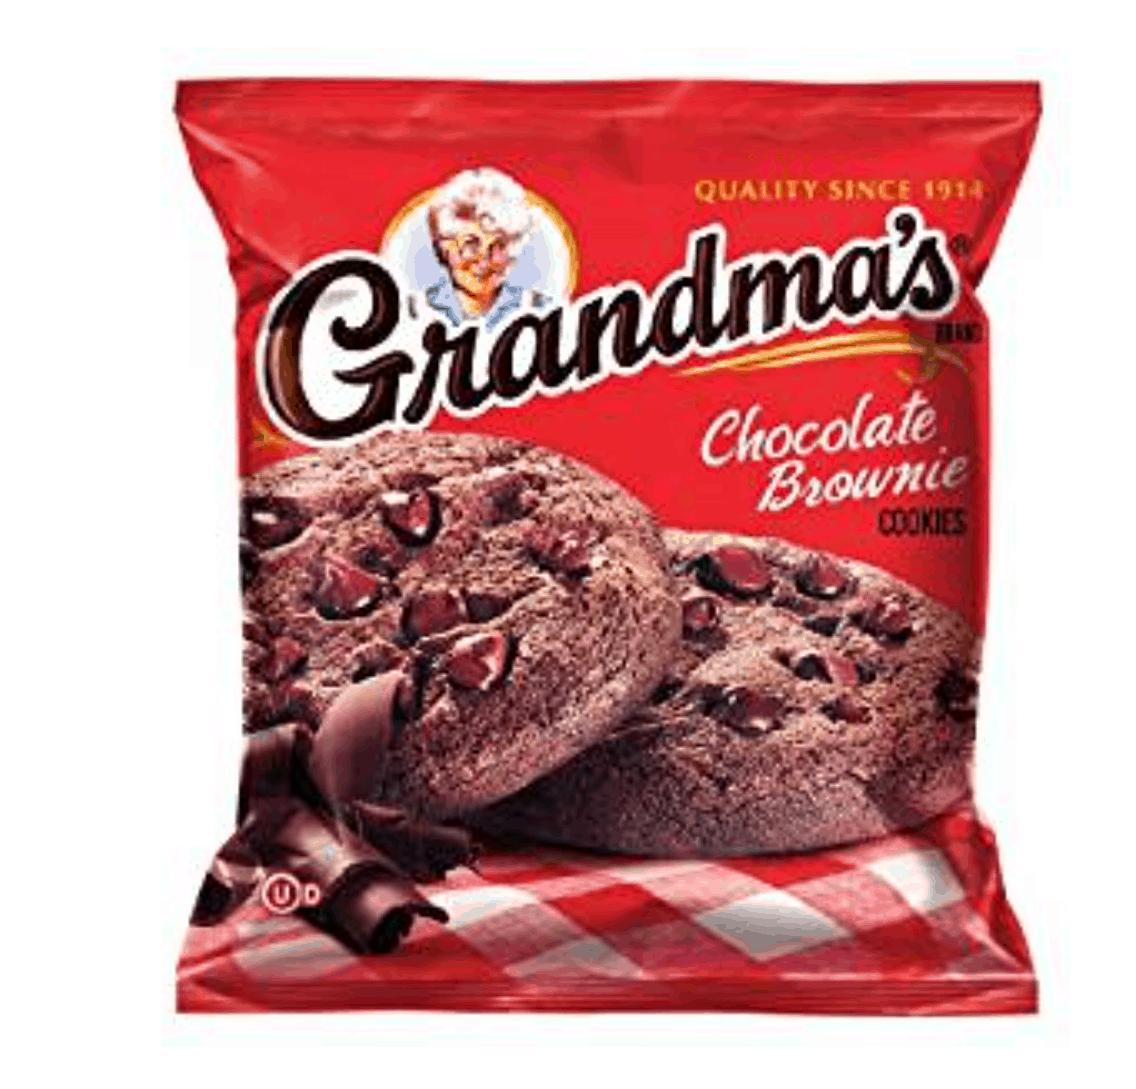 4. Grandma's Brownies